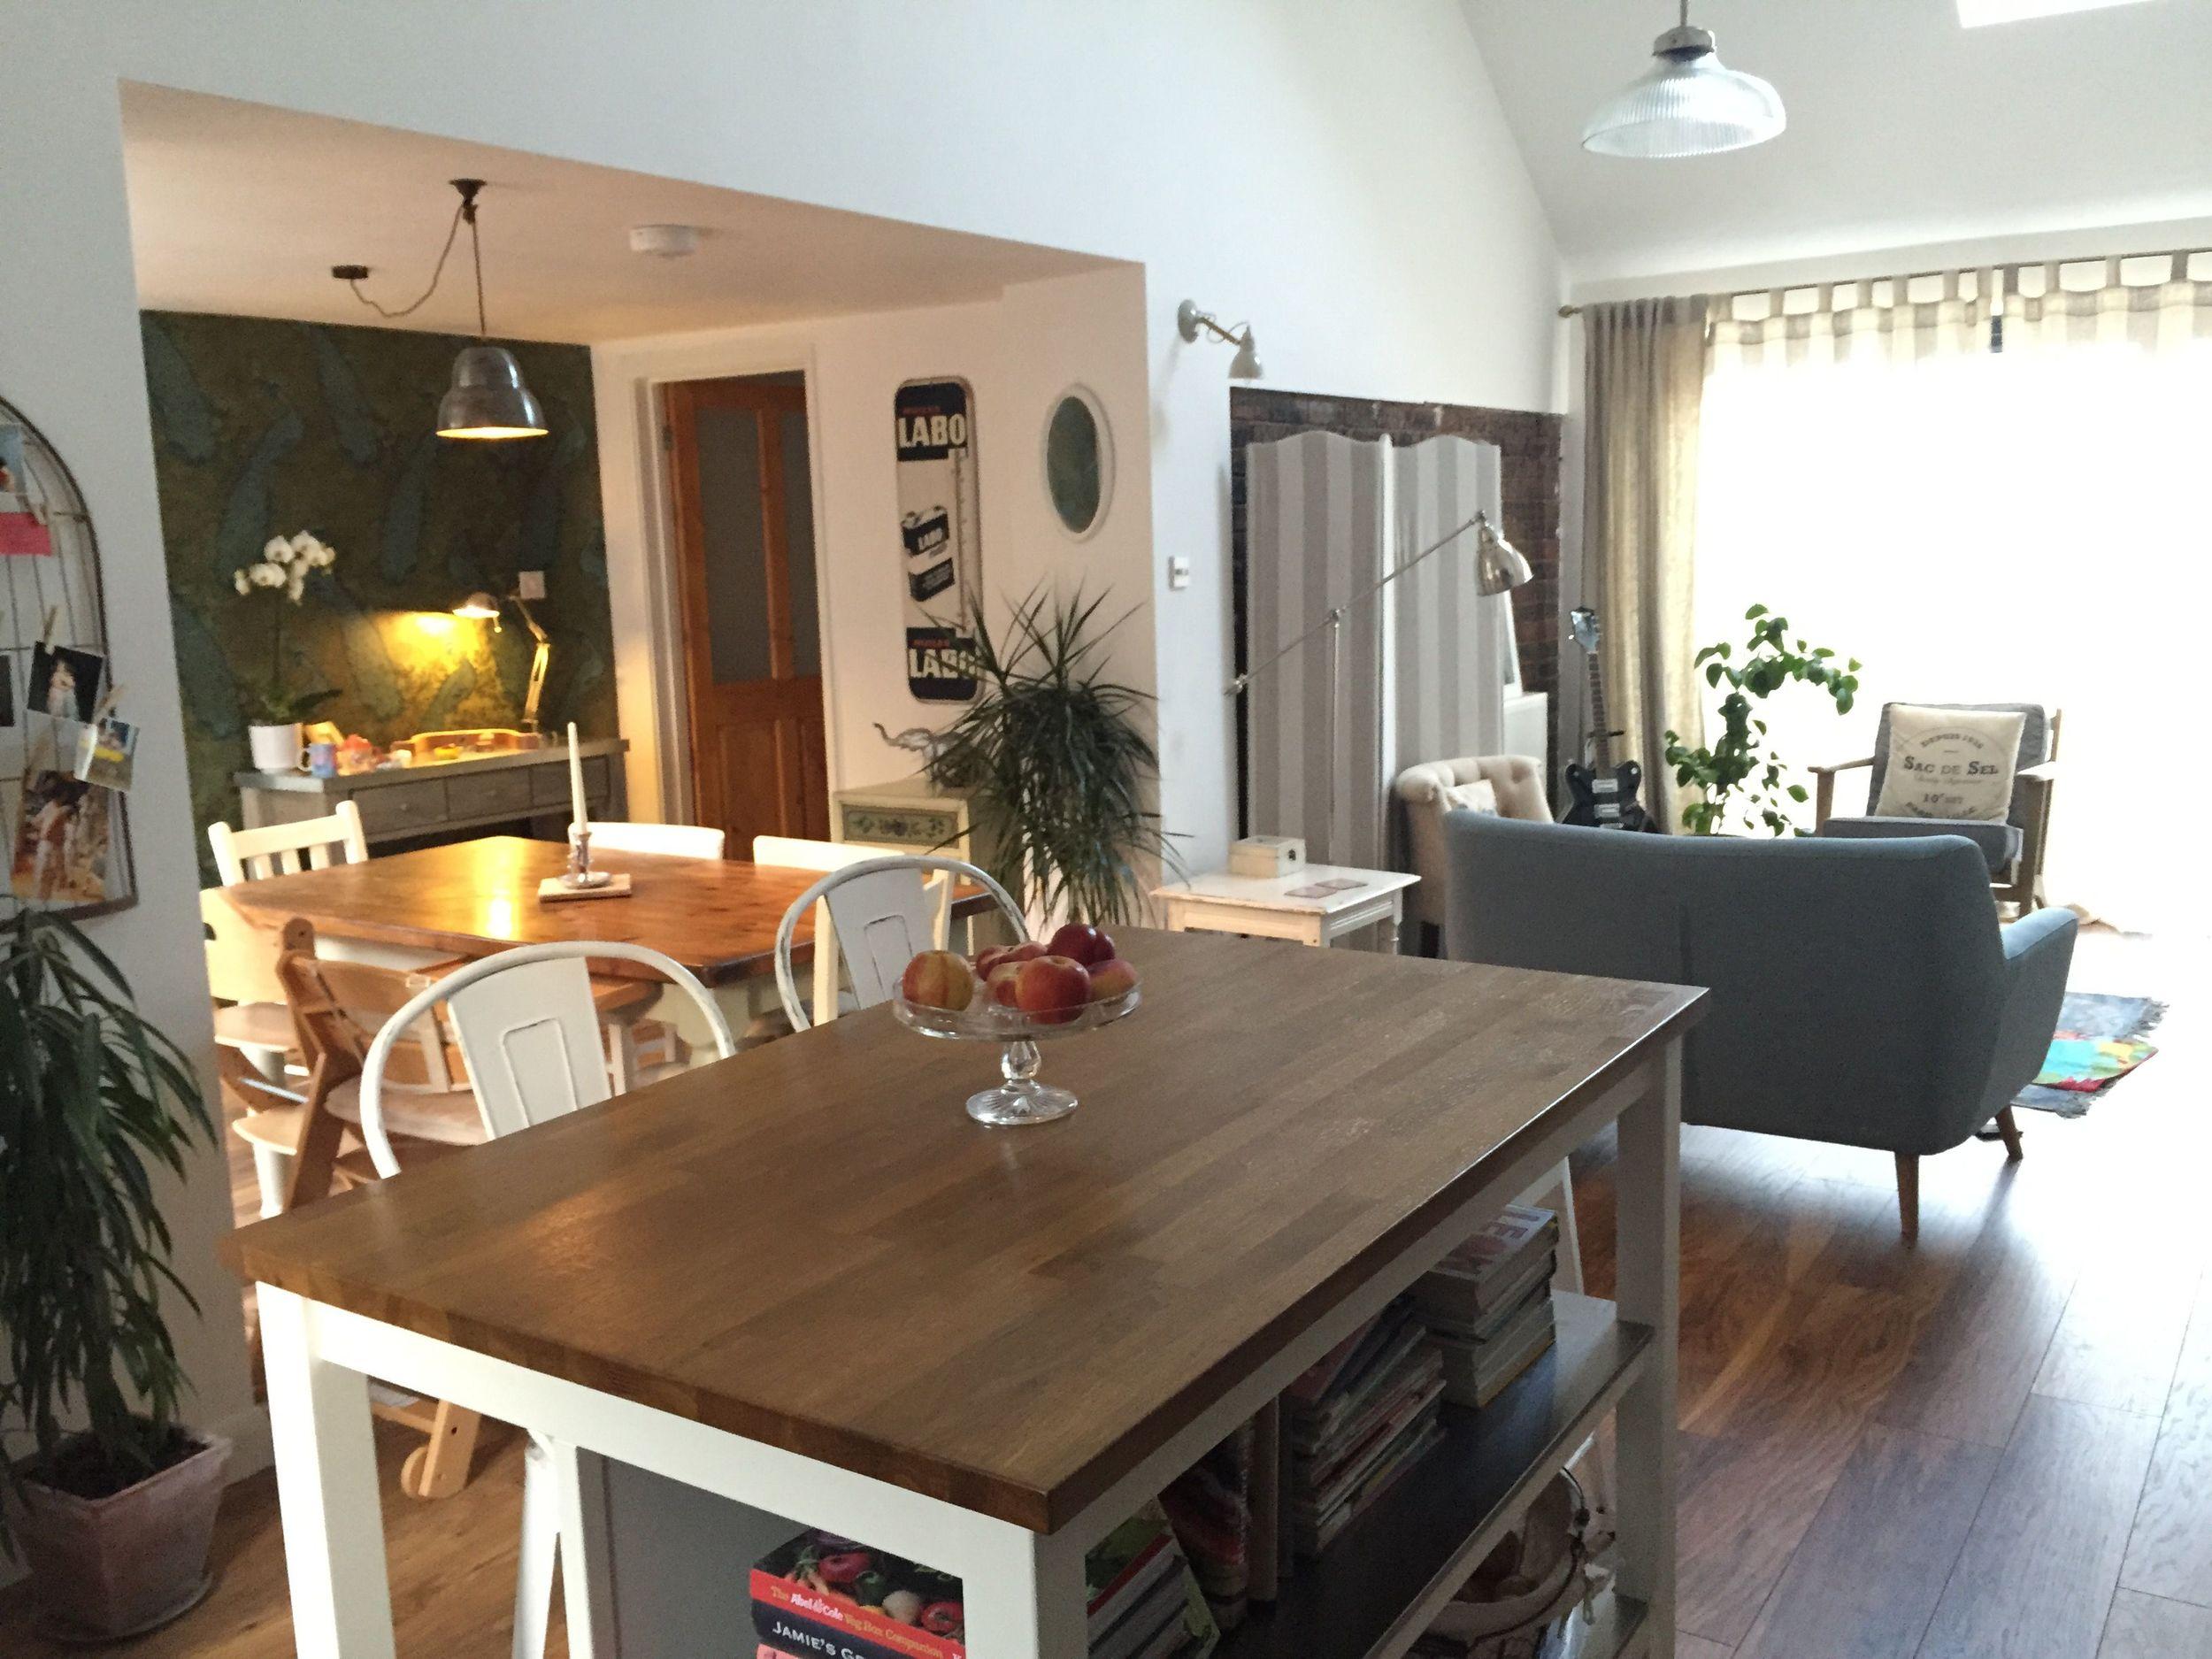 Interior design - residential & commercial interior design, decor and refits, kitchen design, home staging. Shoreham Beach, Sussex